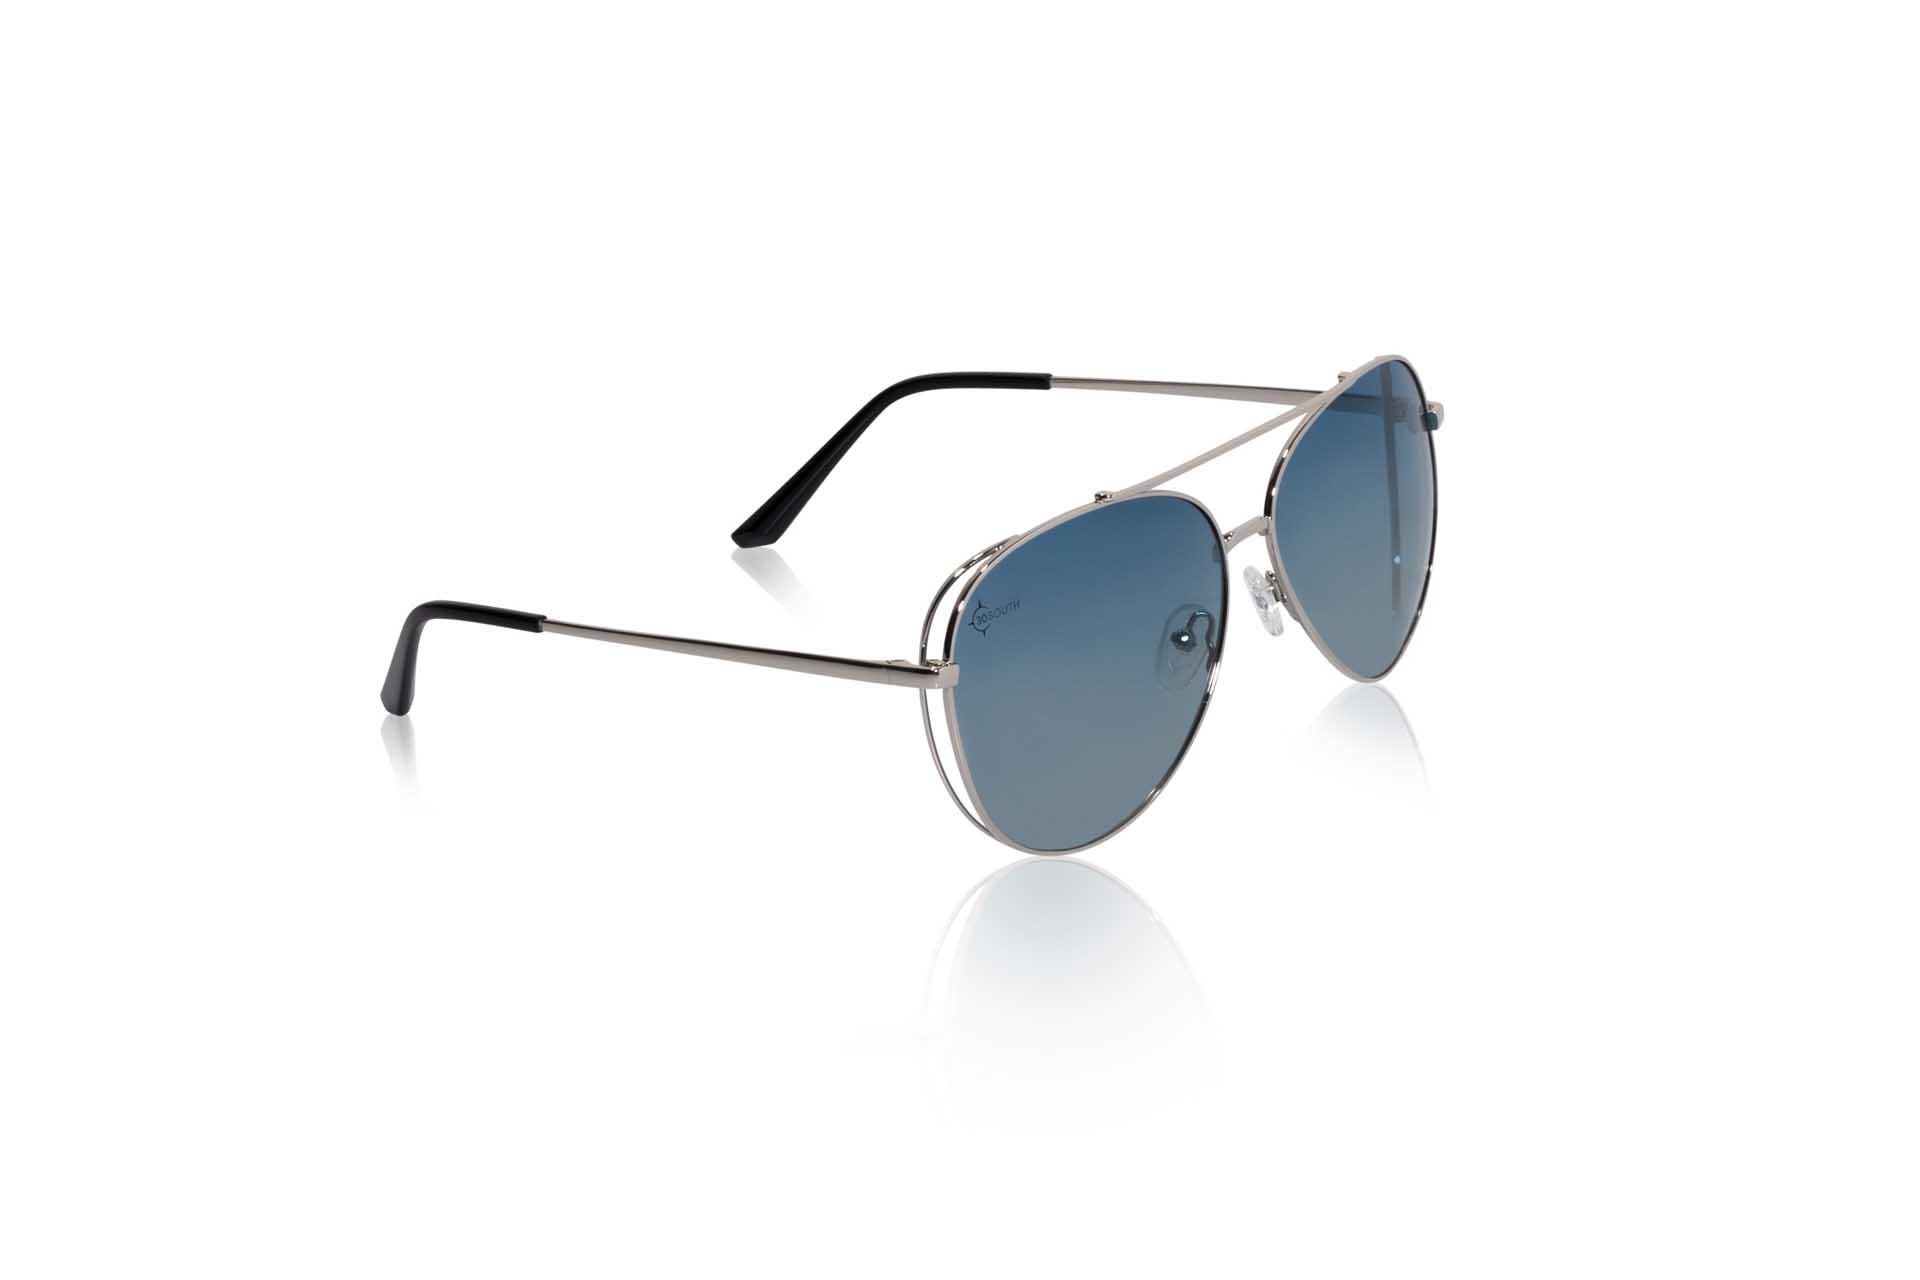 Photo of The Wingman Ice sunglasses